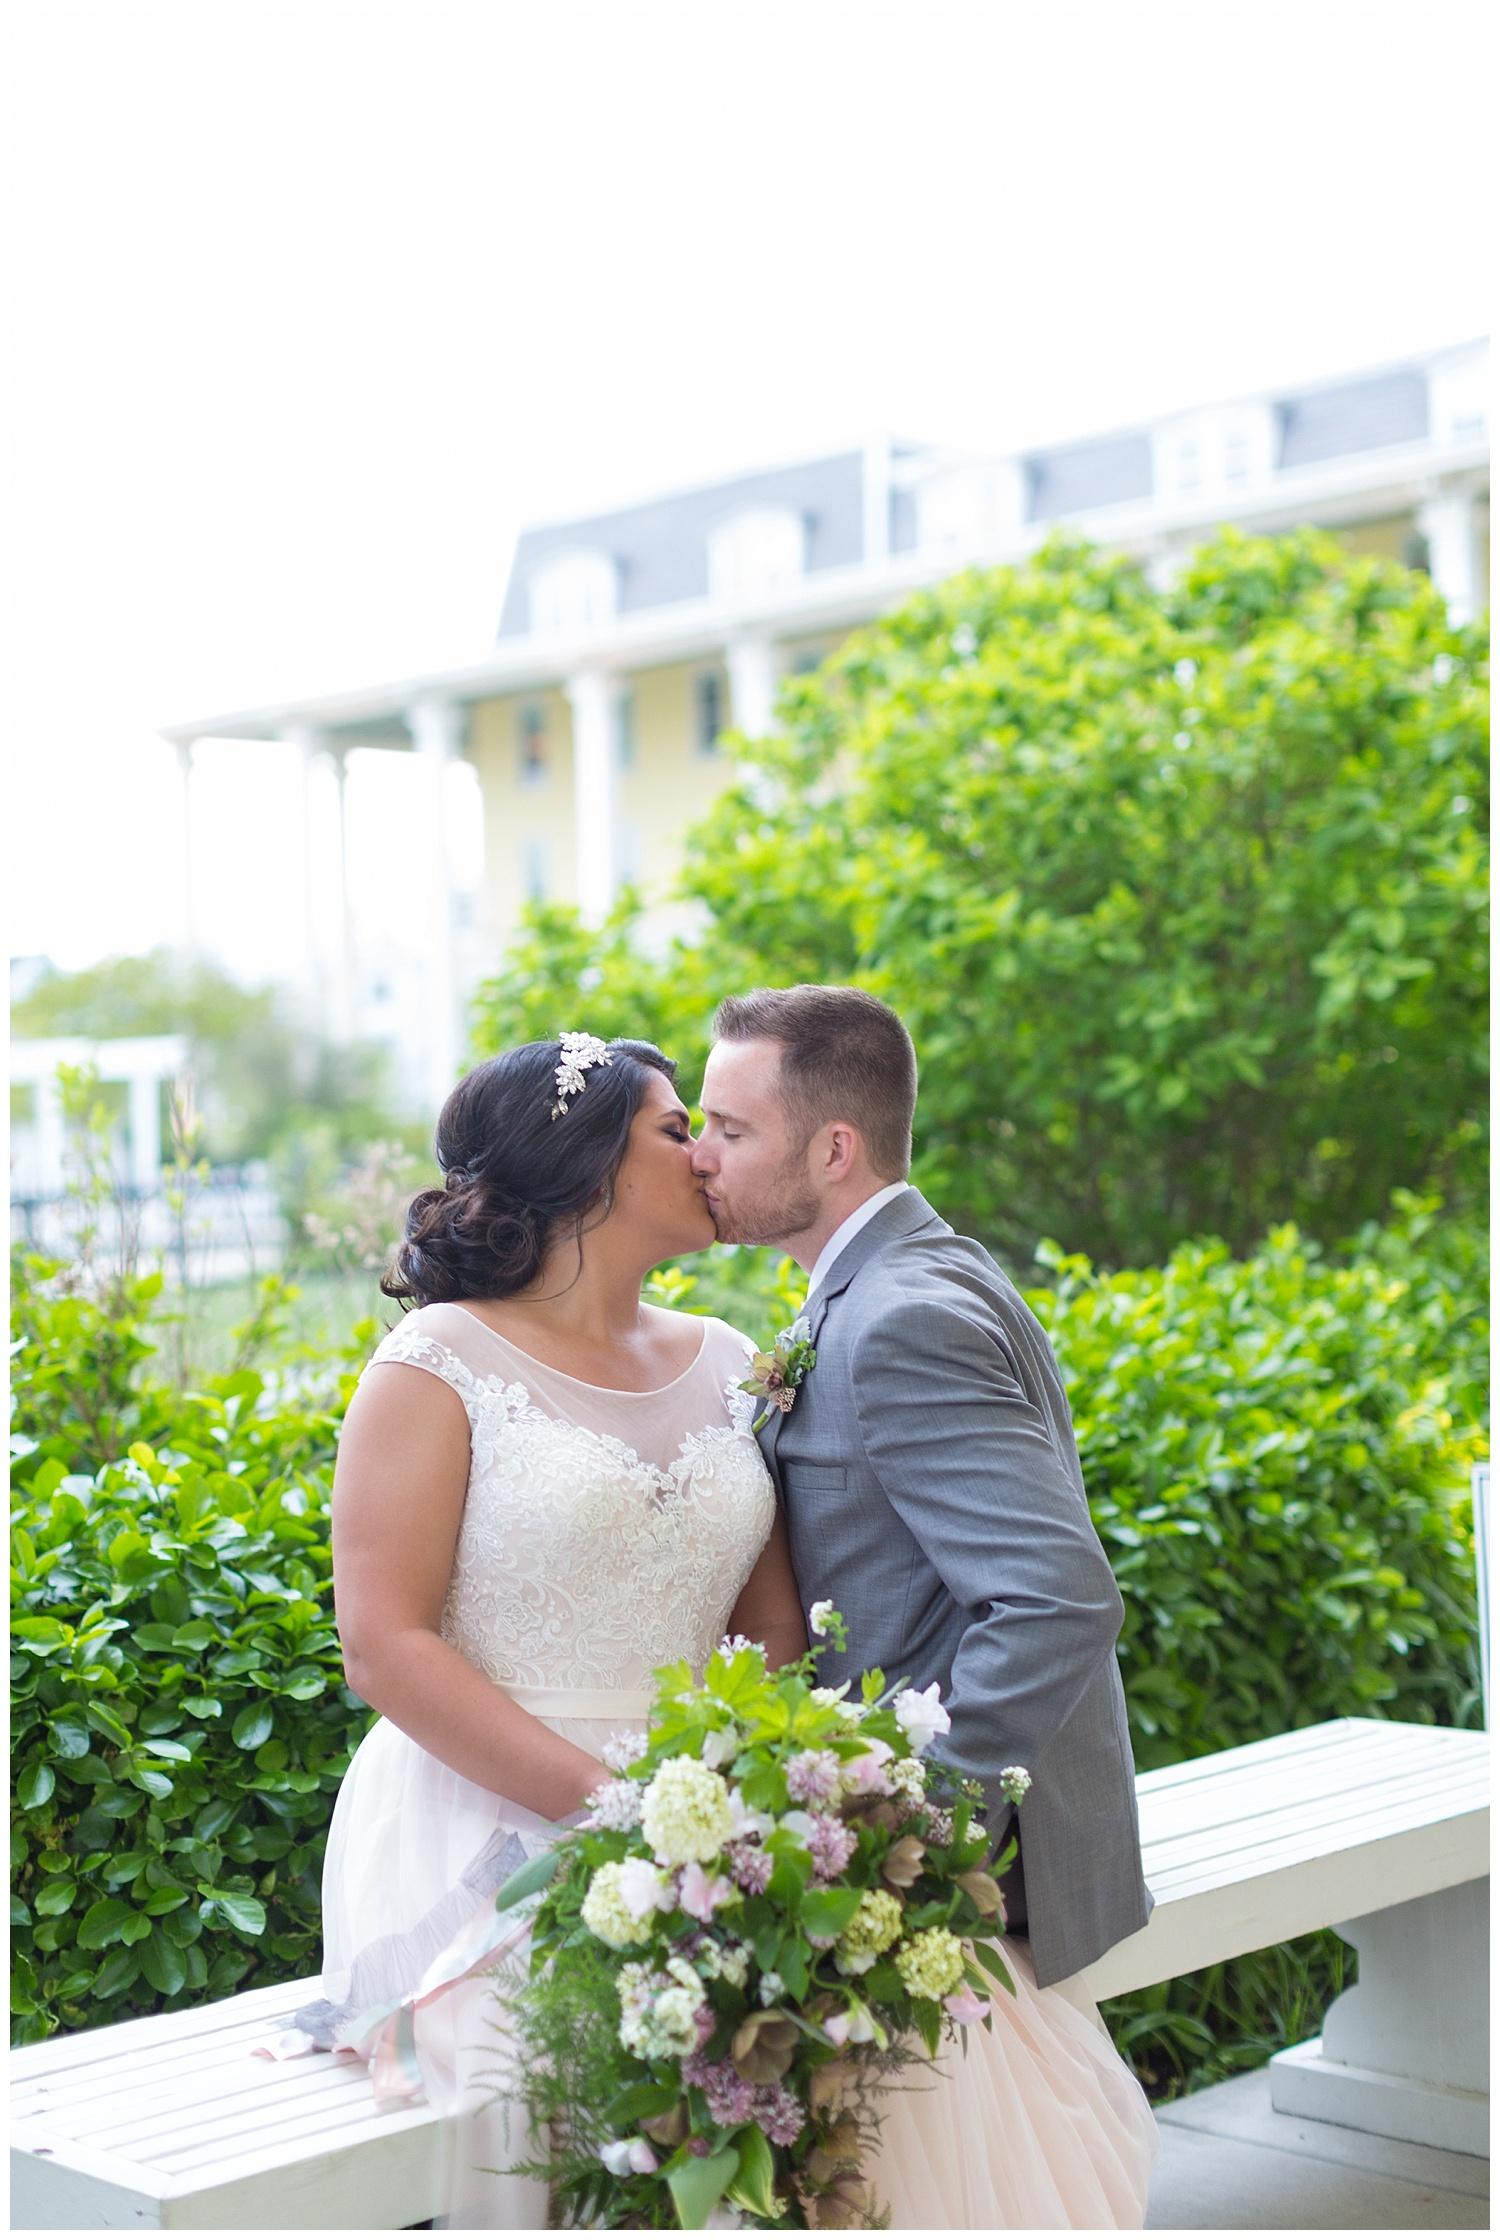 Congress Hall Weddings | Cape May, NJ | www.redoakweddings.com